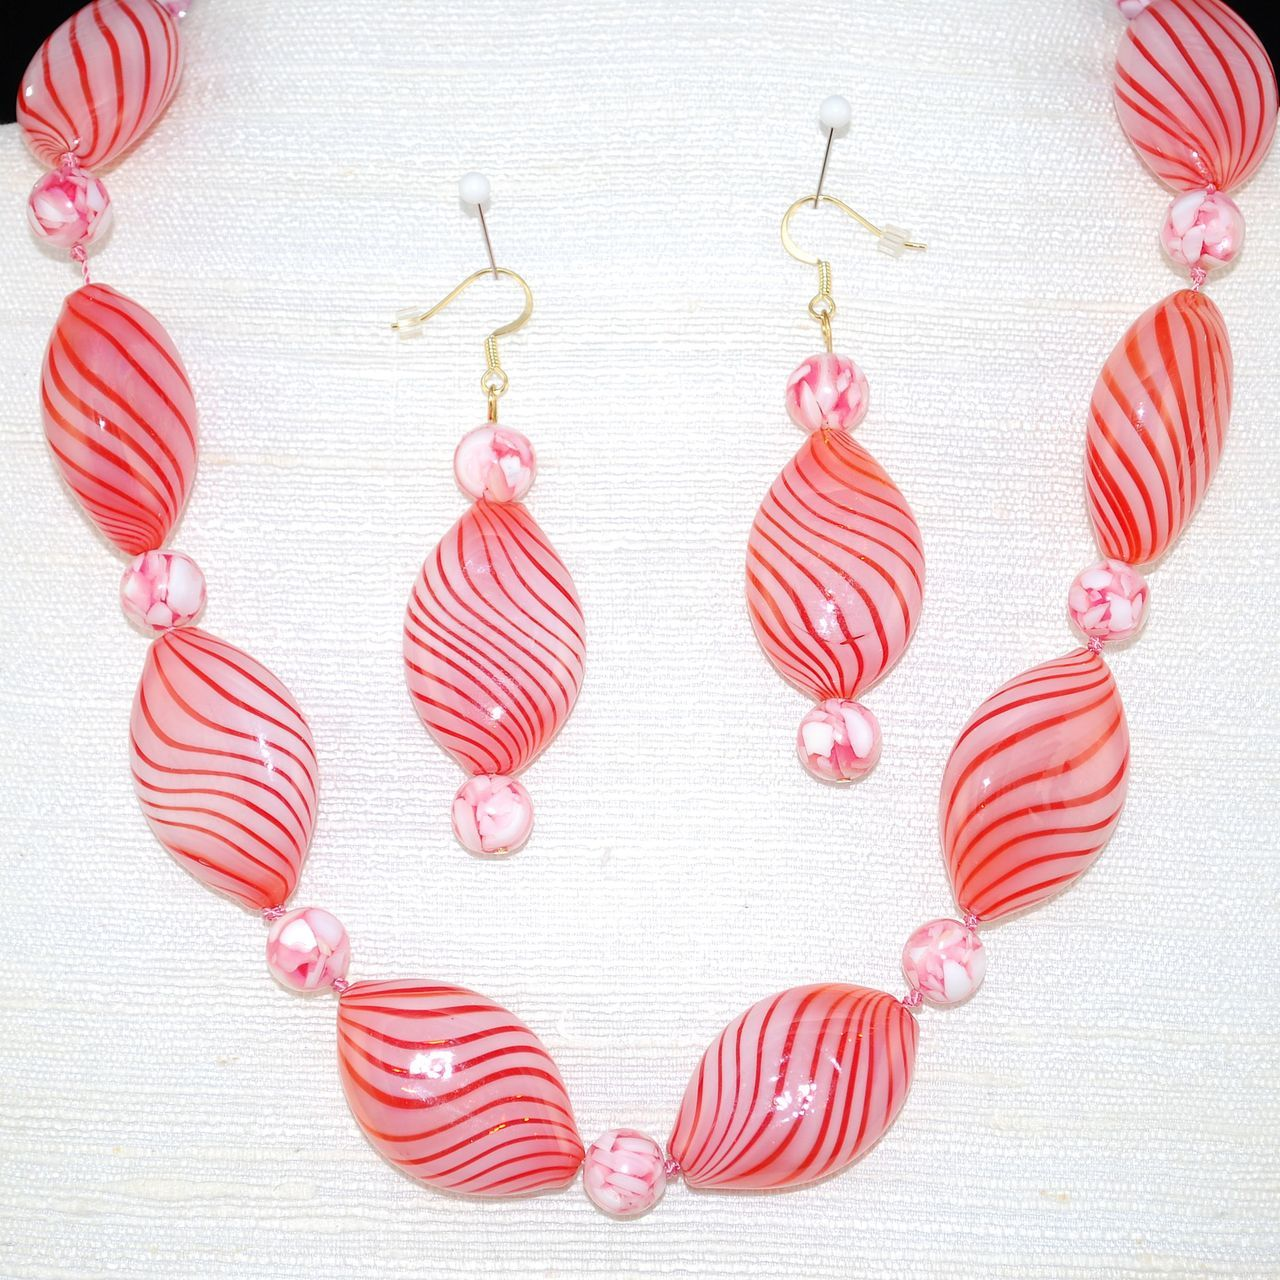 Enchanting Jewelry Creations image 12